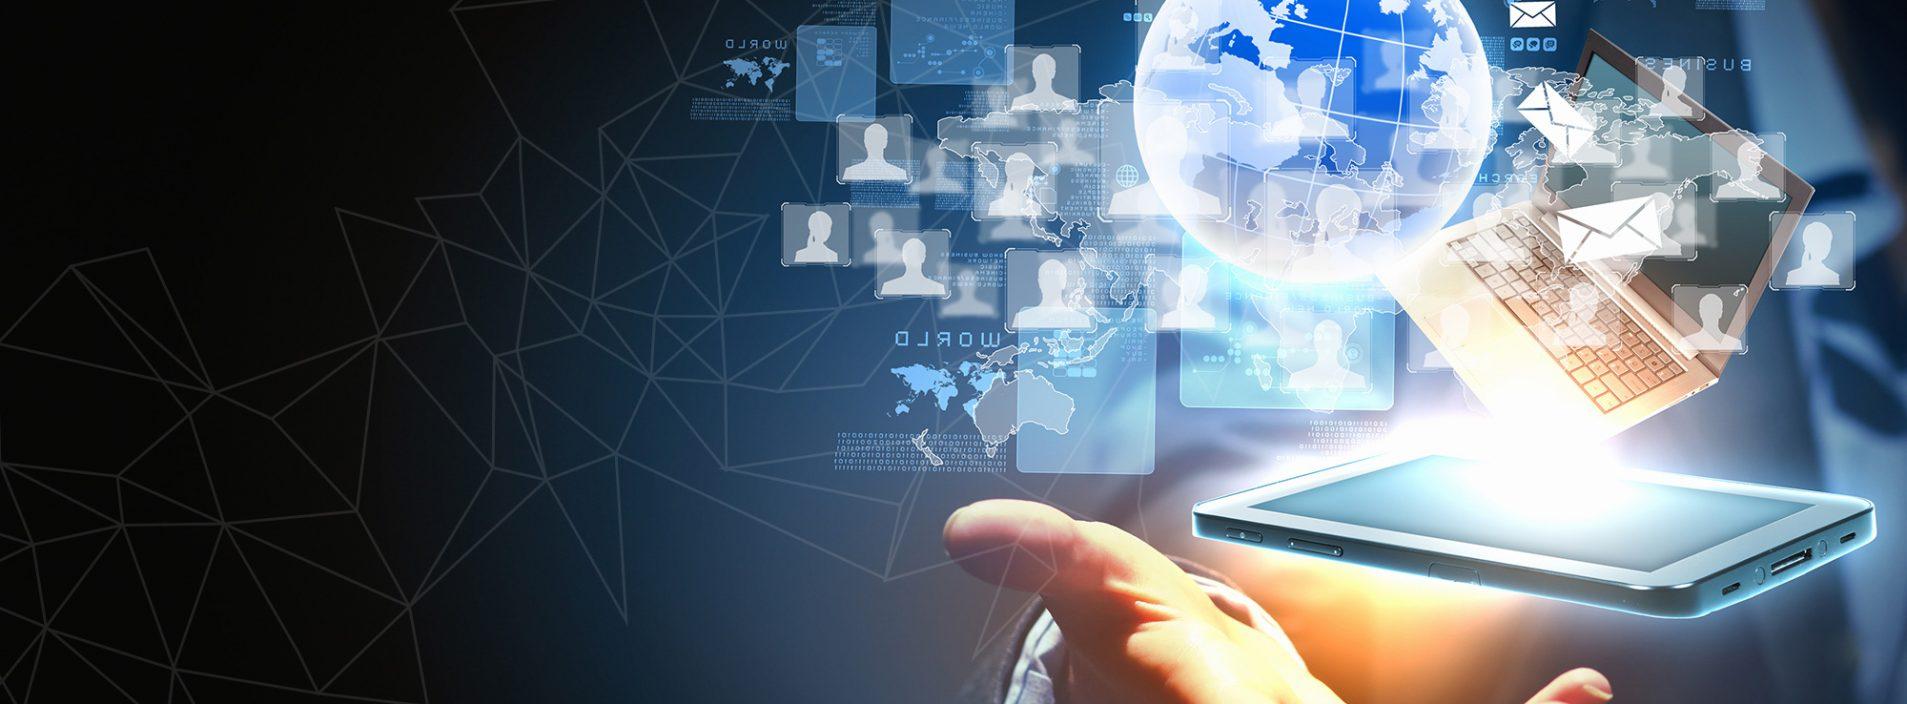 Microsoft e MasterCard planejam juntas identidade digital universal